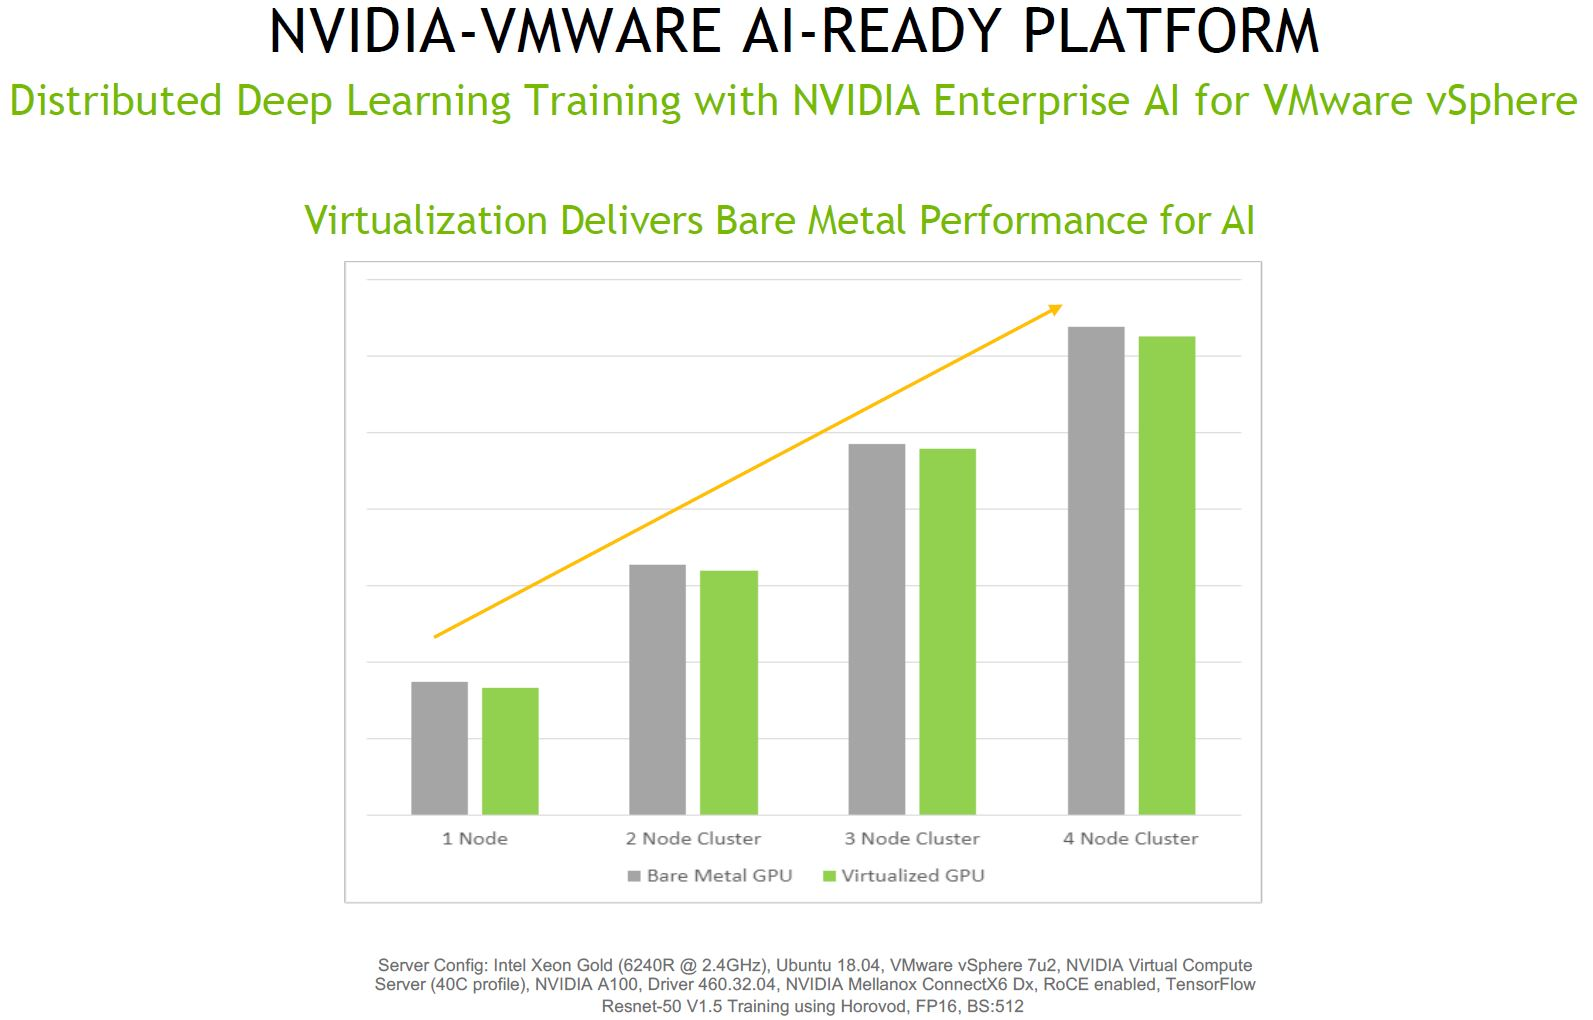 VMware VSphere Virtualization Performance Loss With NVIDIA GPUs